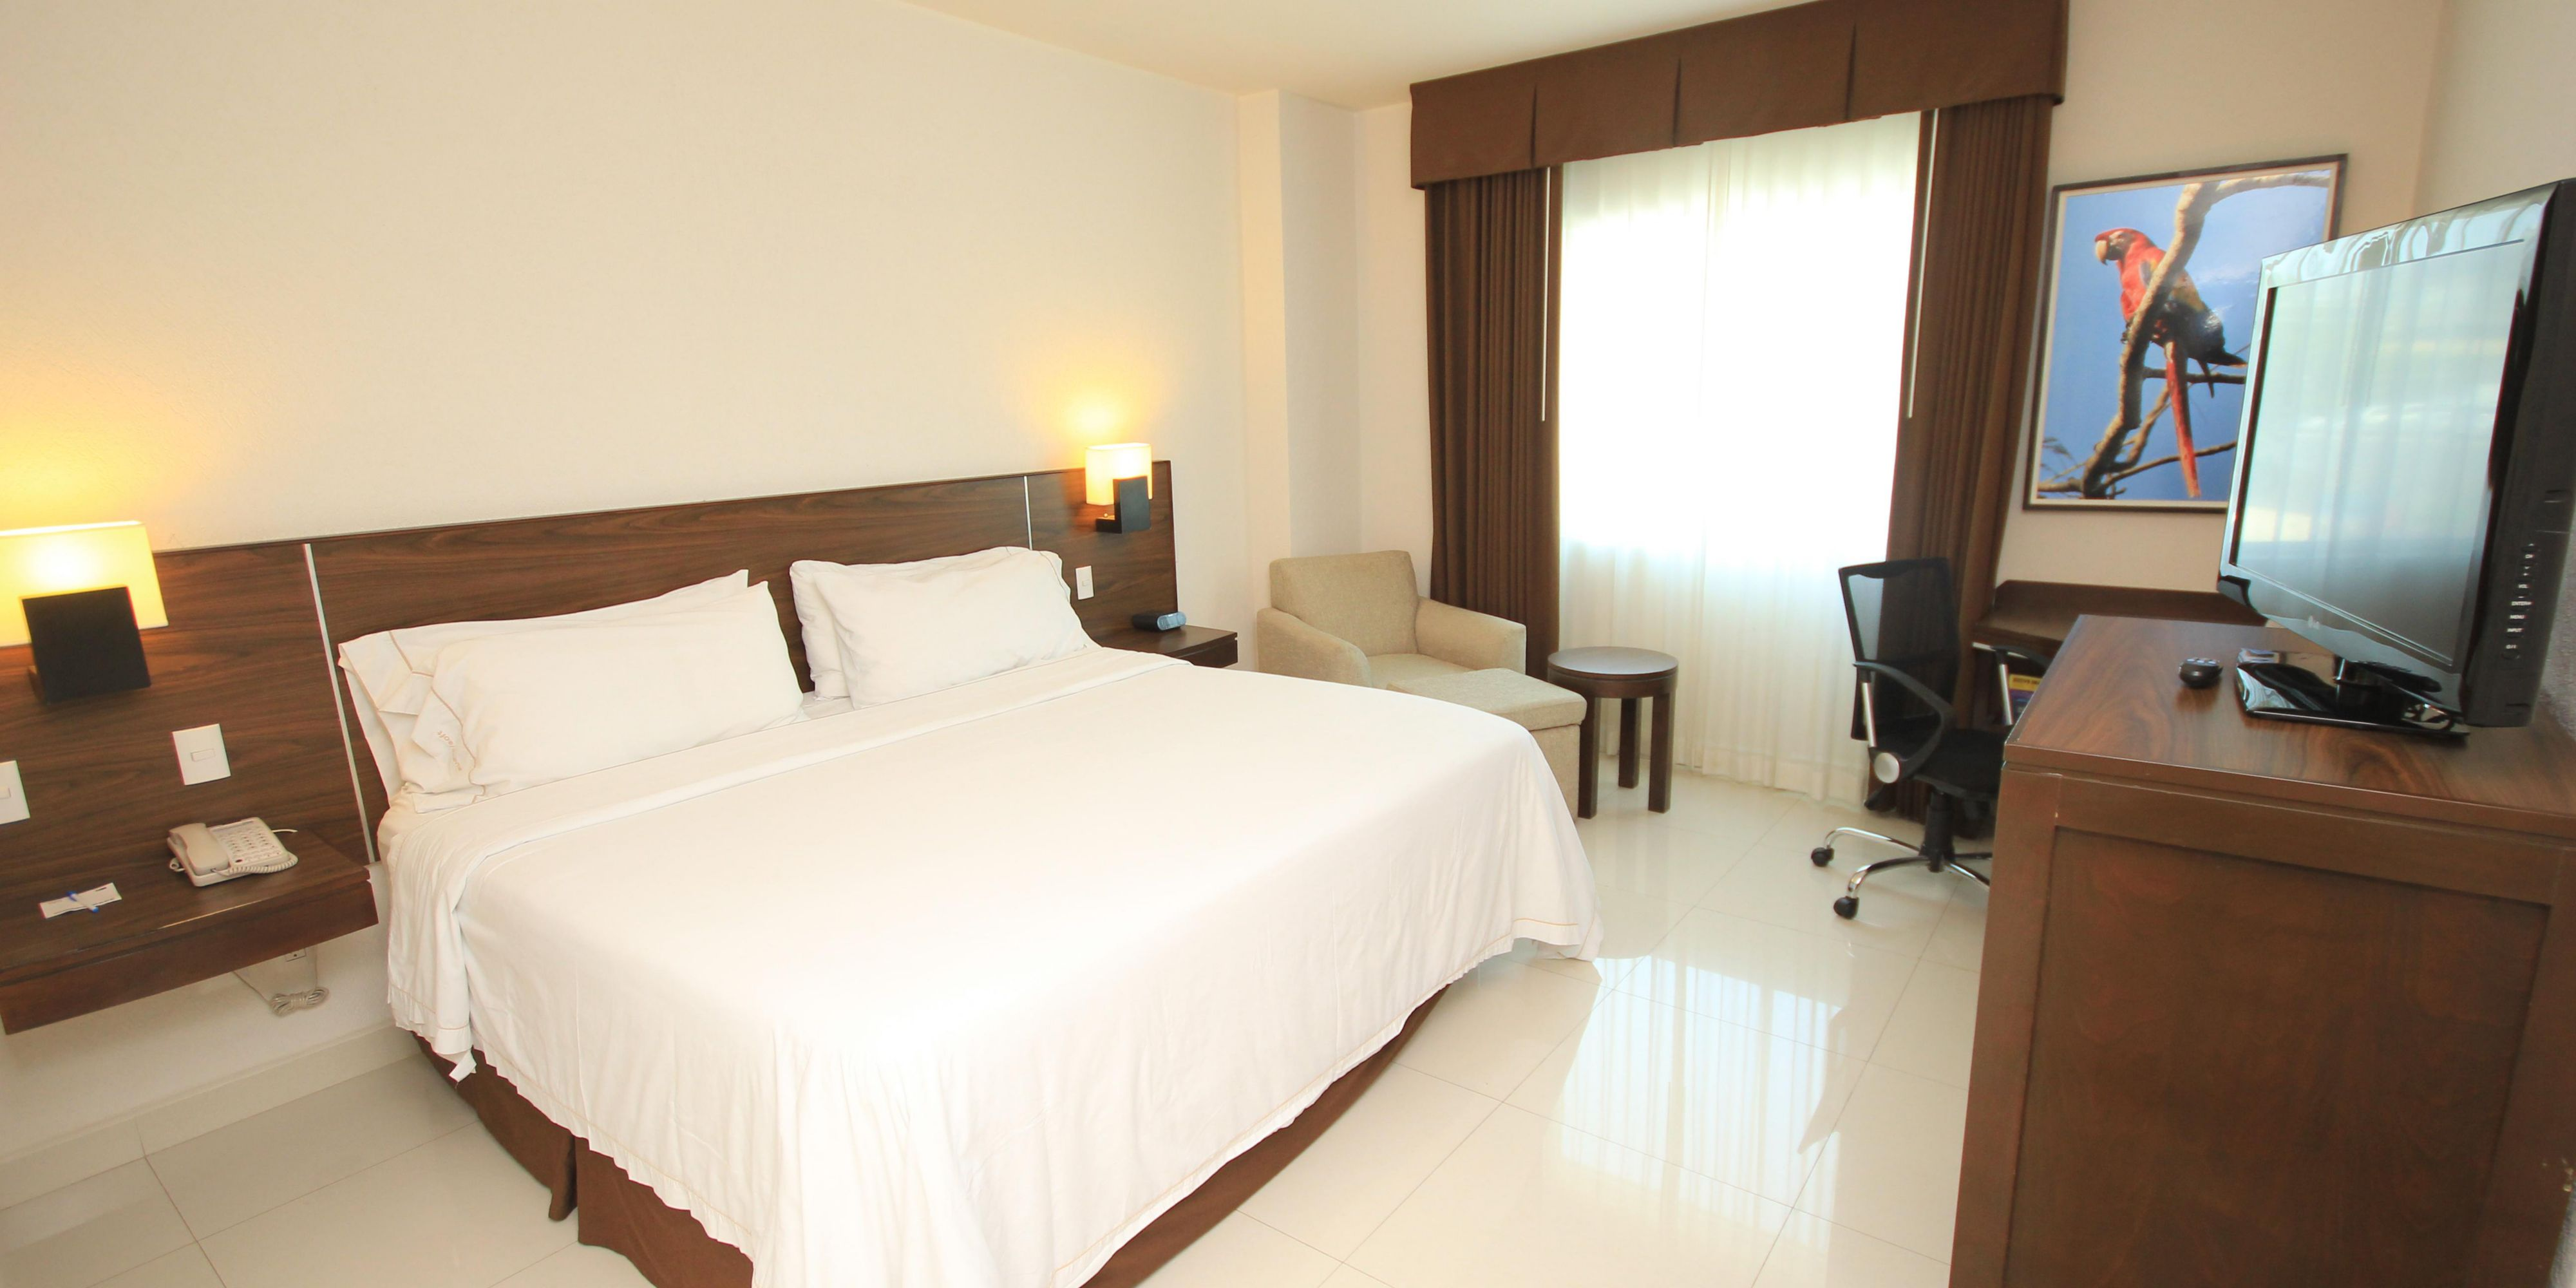 Holiday Inn Express Tuxtla Gutierrez La Marimba Hotel by IHG